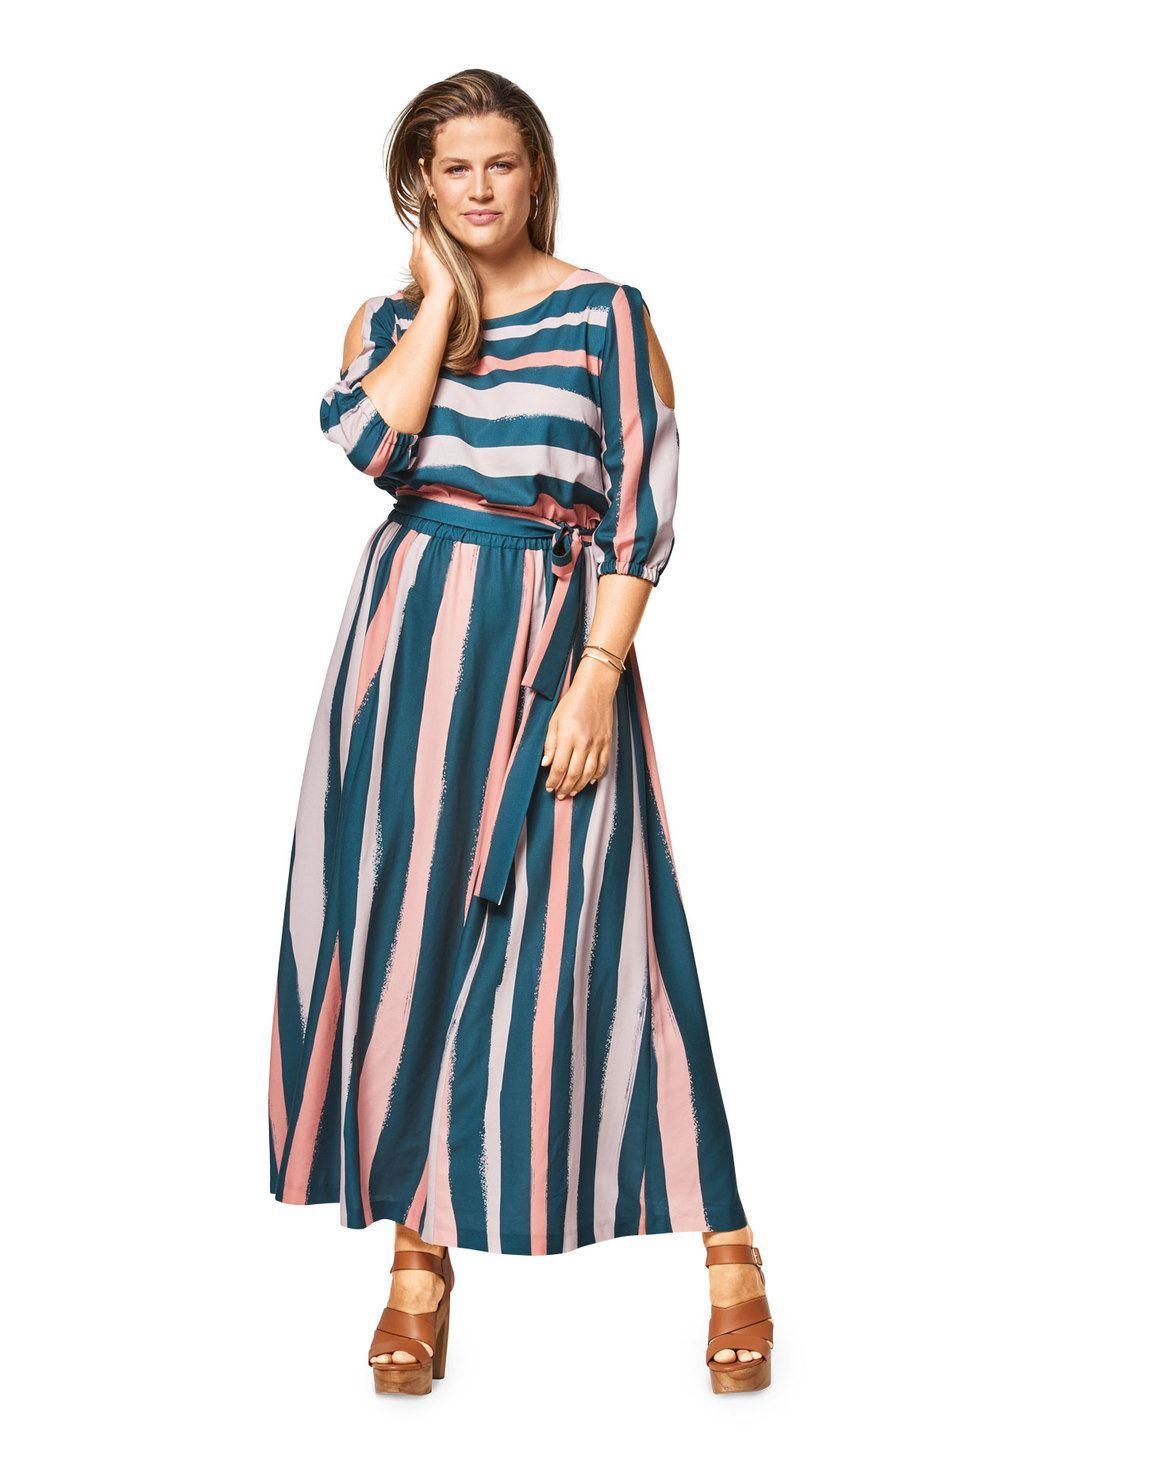 burda style, Schnittmuster, Sommerkleid F/S 20 #20A